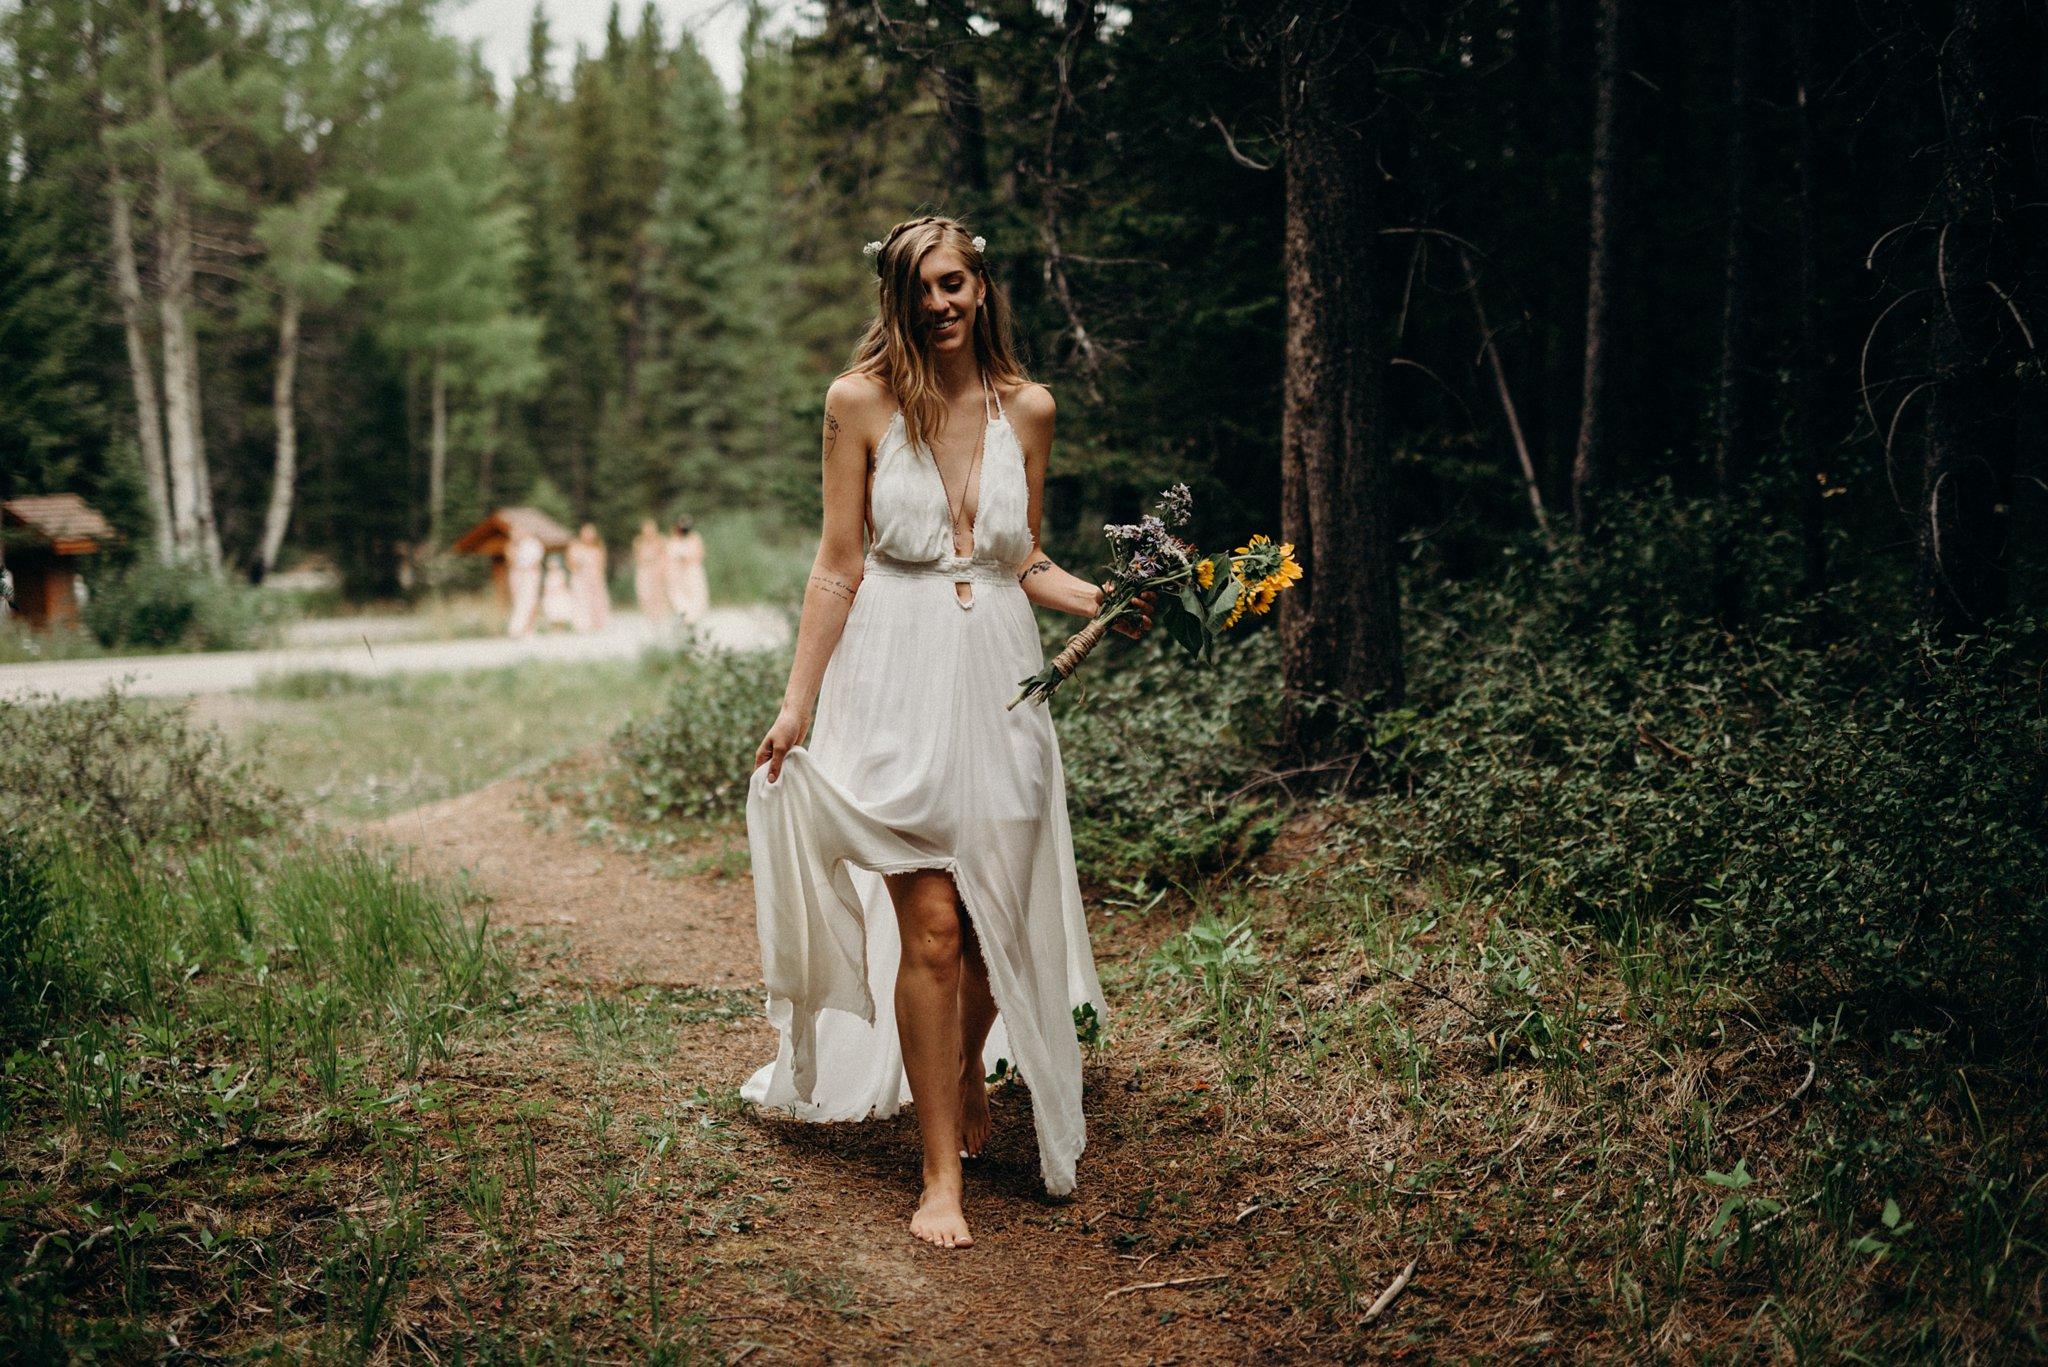 kaihla_tonai_intimate_wedding_elopement_photographer_6359.jpg